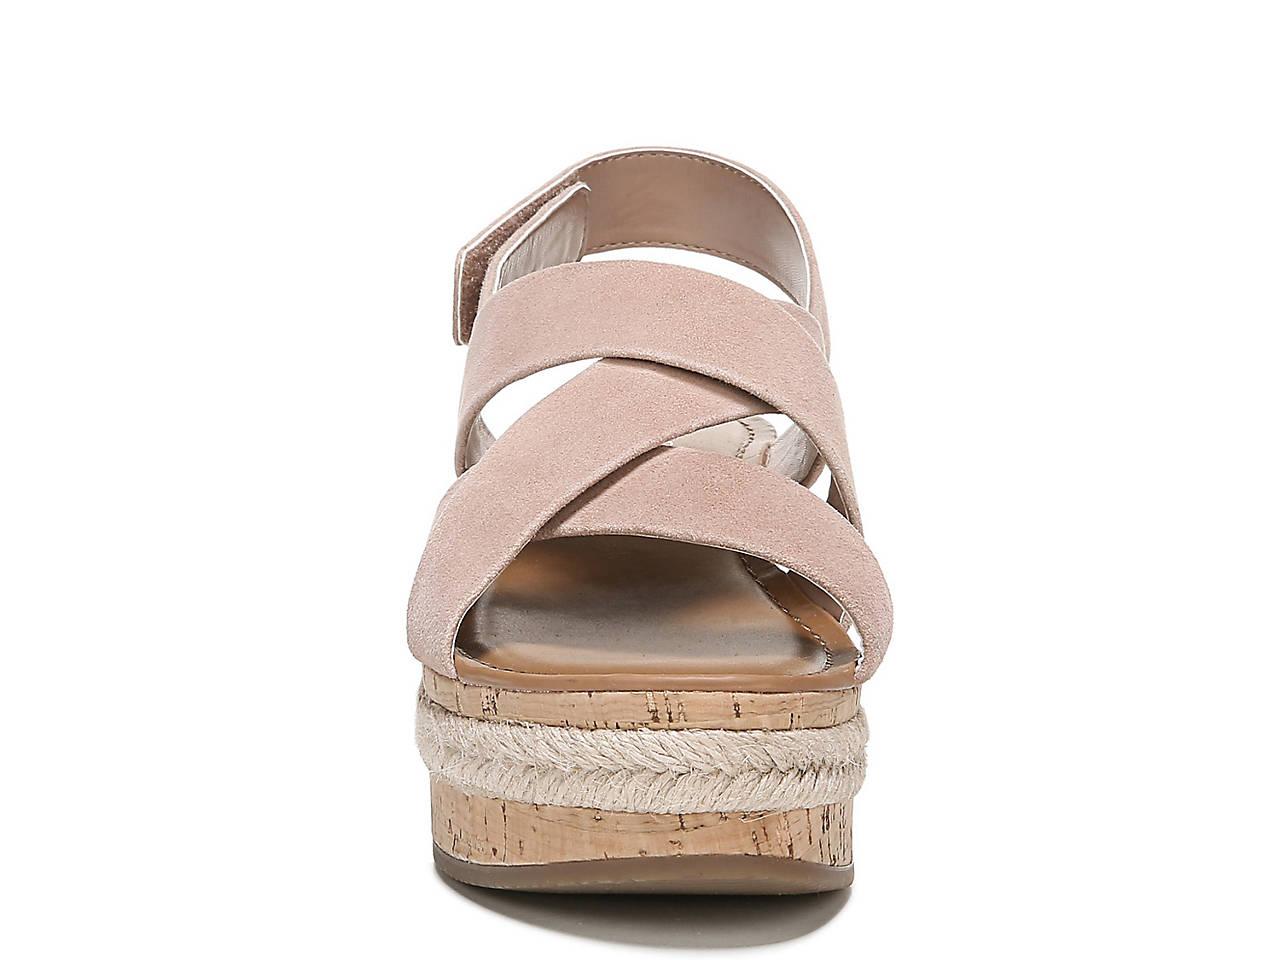 b7189e4ae Franco Sarto Nessa Espadrille Wedge Sandal Women s Shoes